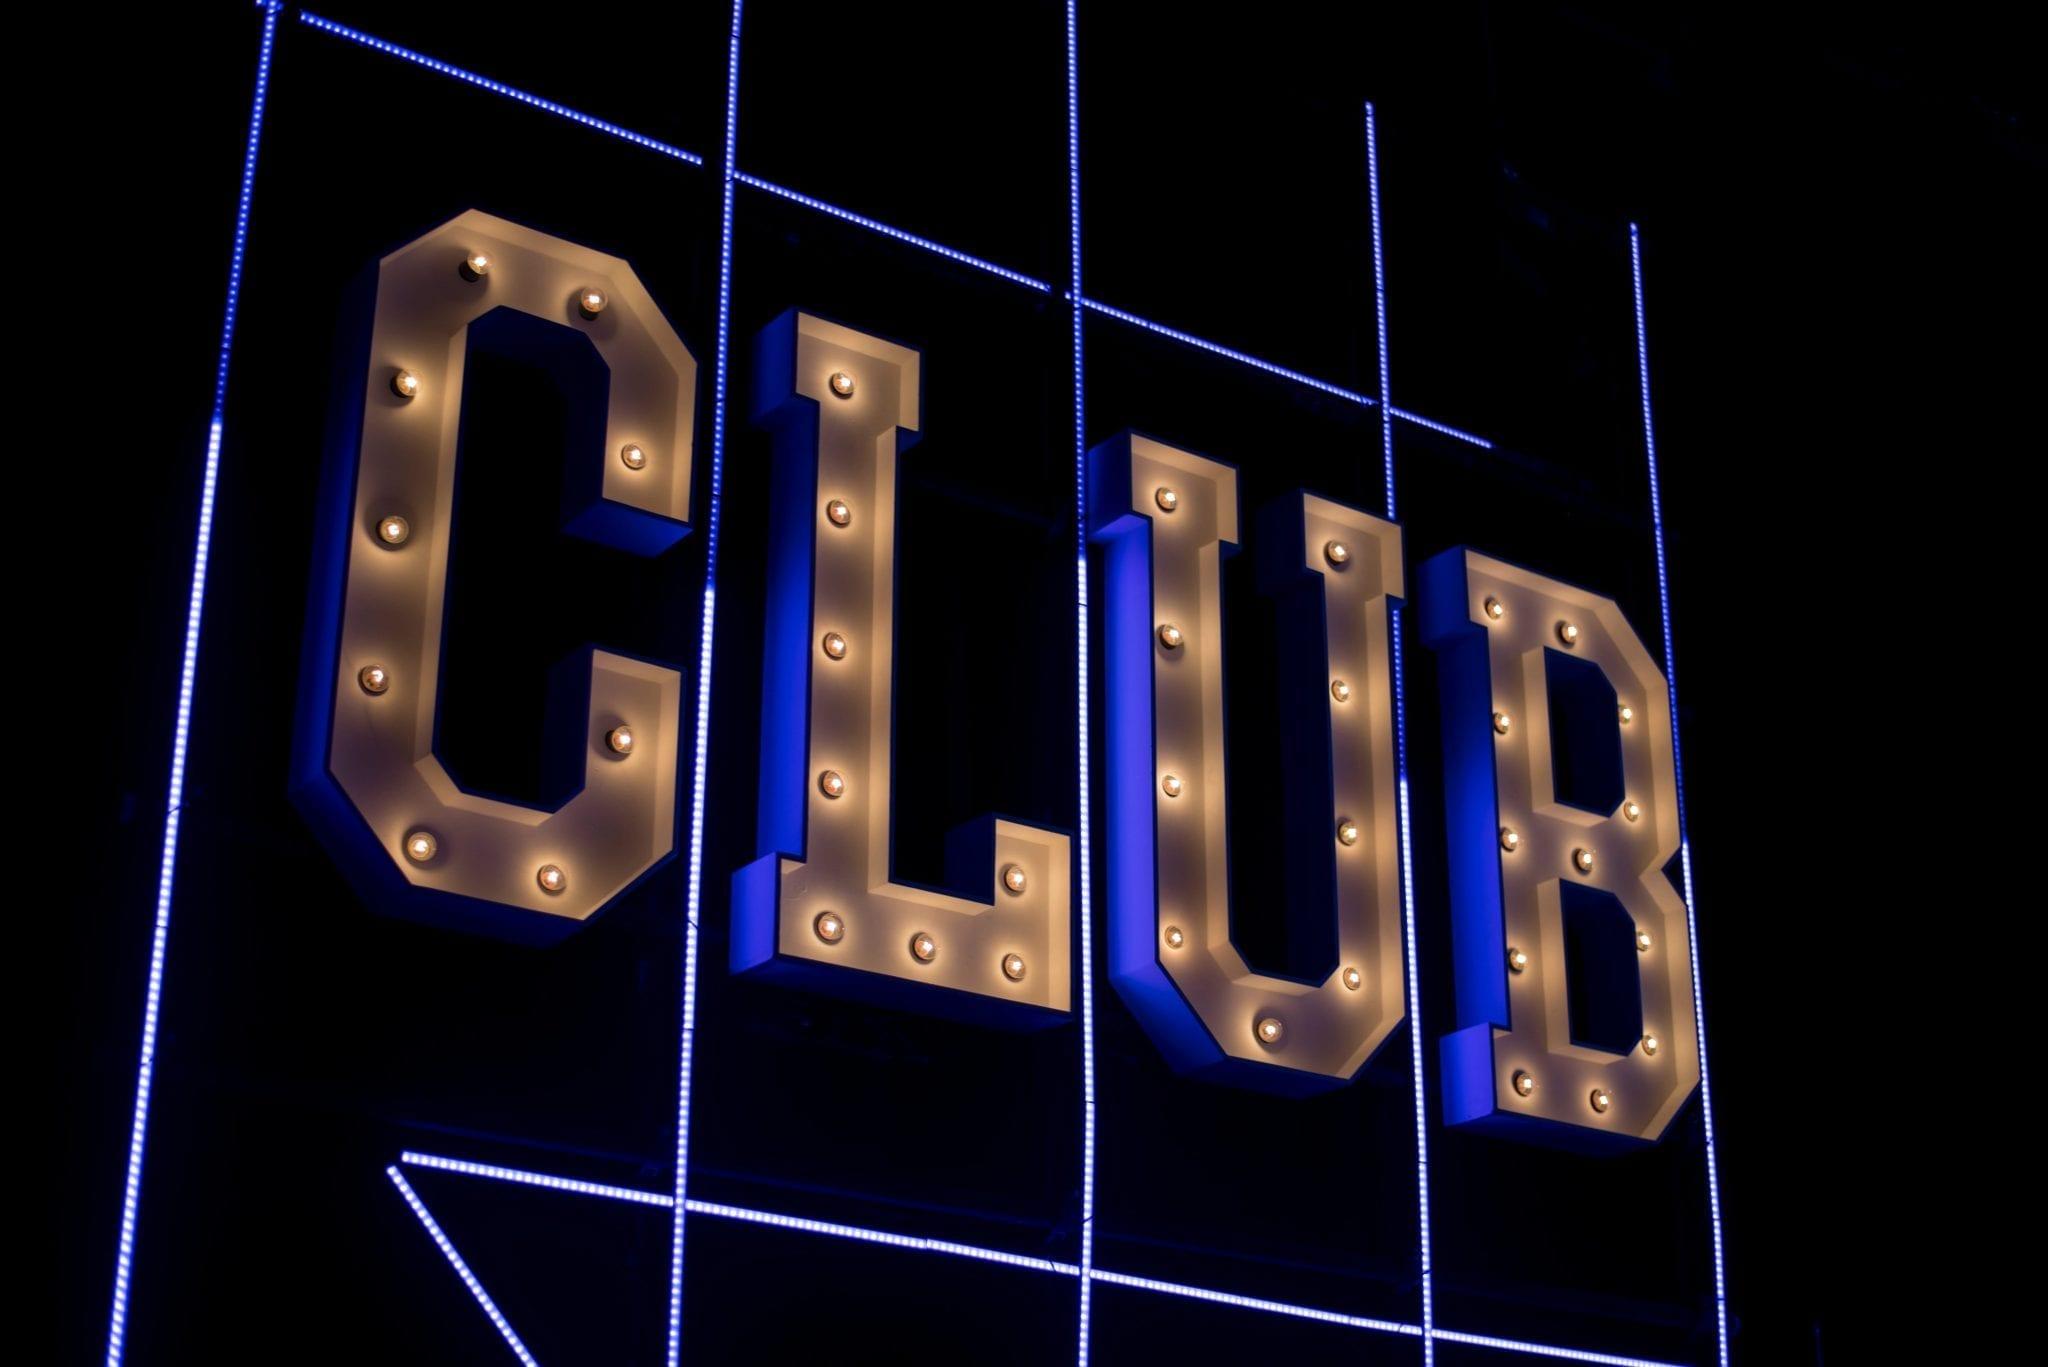 City Asks Judge to Dismiss Pulse Nightclub Civil Rights Lawsuit